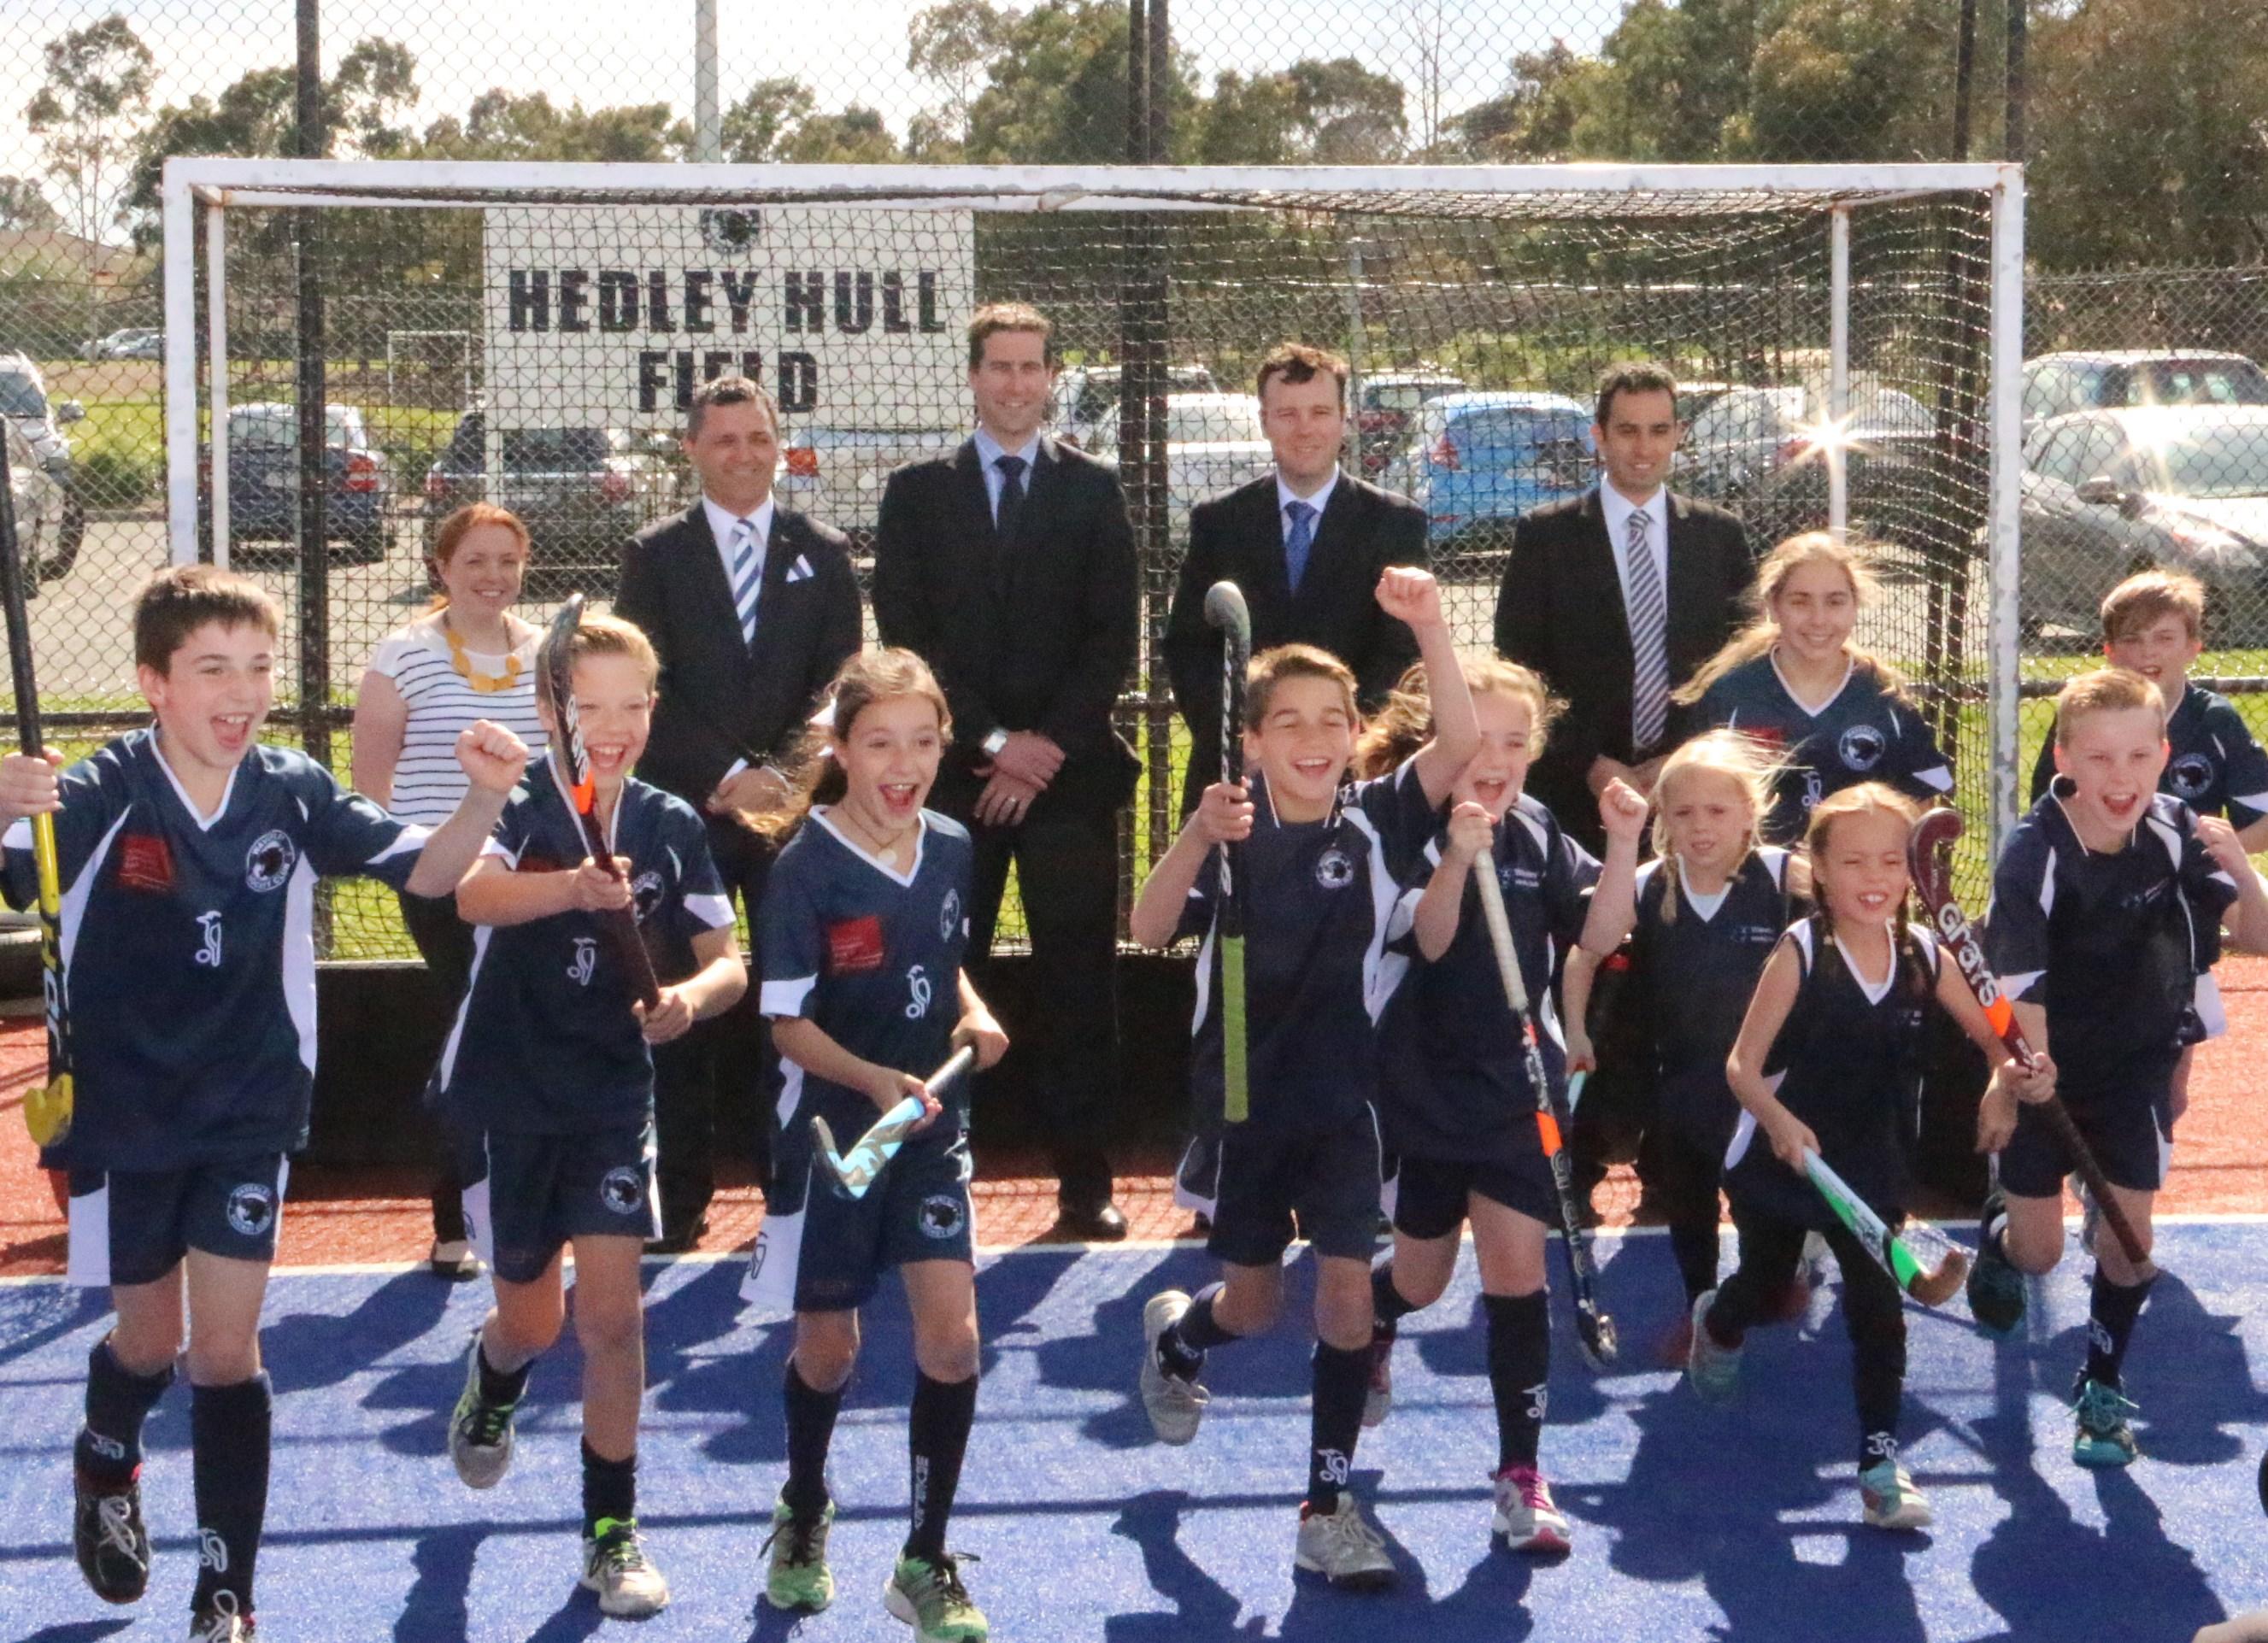 Photo-20140924-Waverley-Hockey-Club-Graham-Watt-MP-Cr-Paterson-Graham-Drew-Ashton-Michael-Gidley-MP-Cr-Zographos-players-RK